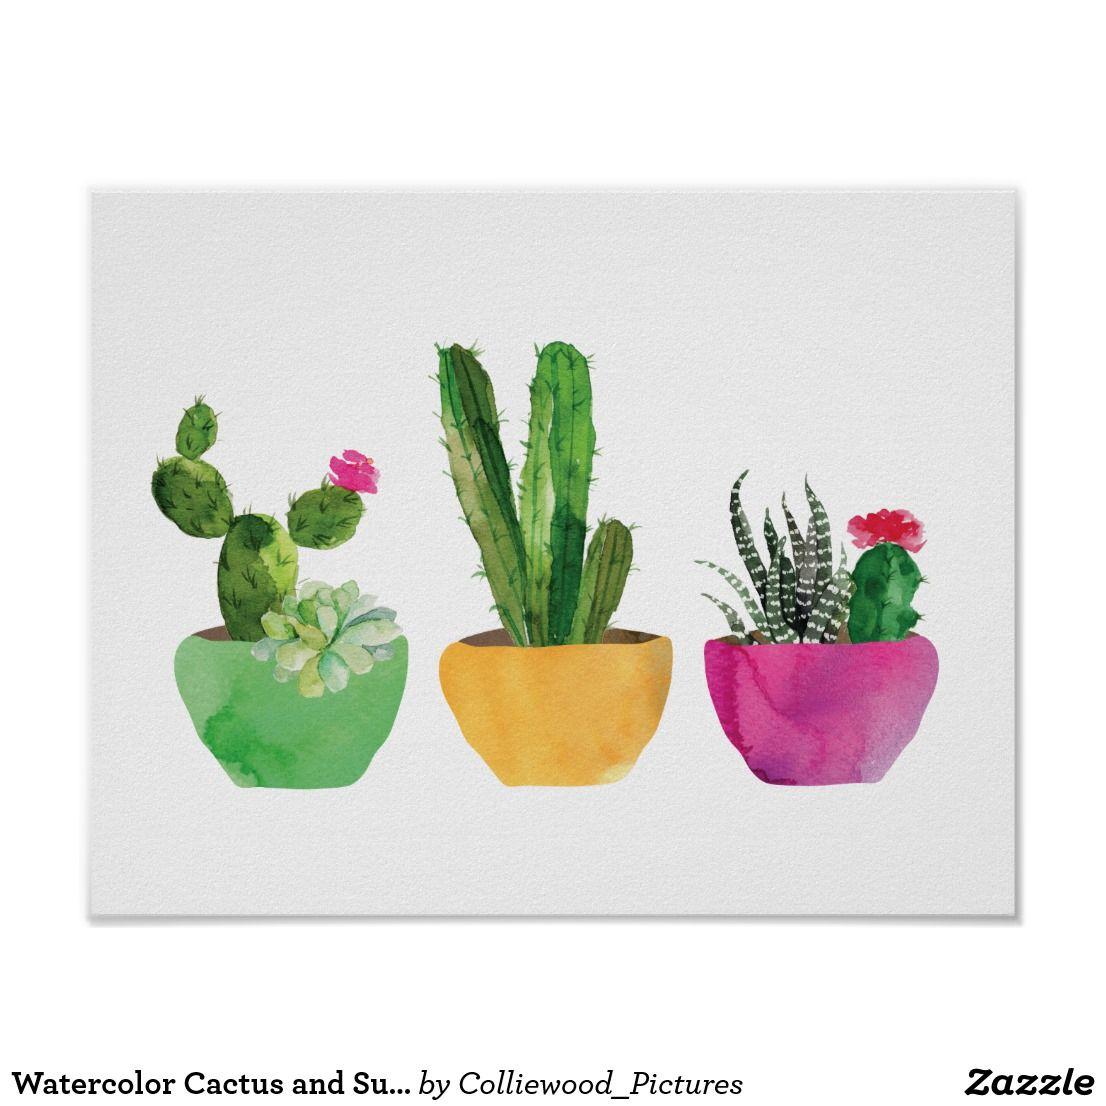 Watercolor Cactus And Succulent Print Zazzle Com In 2020